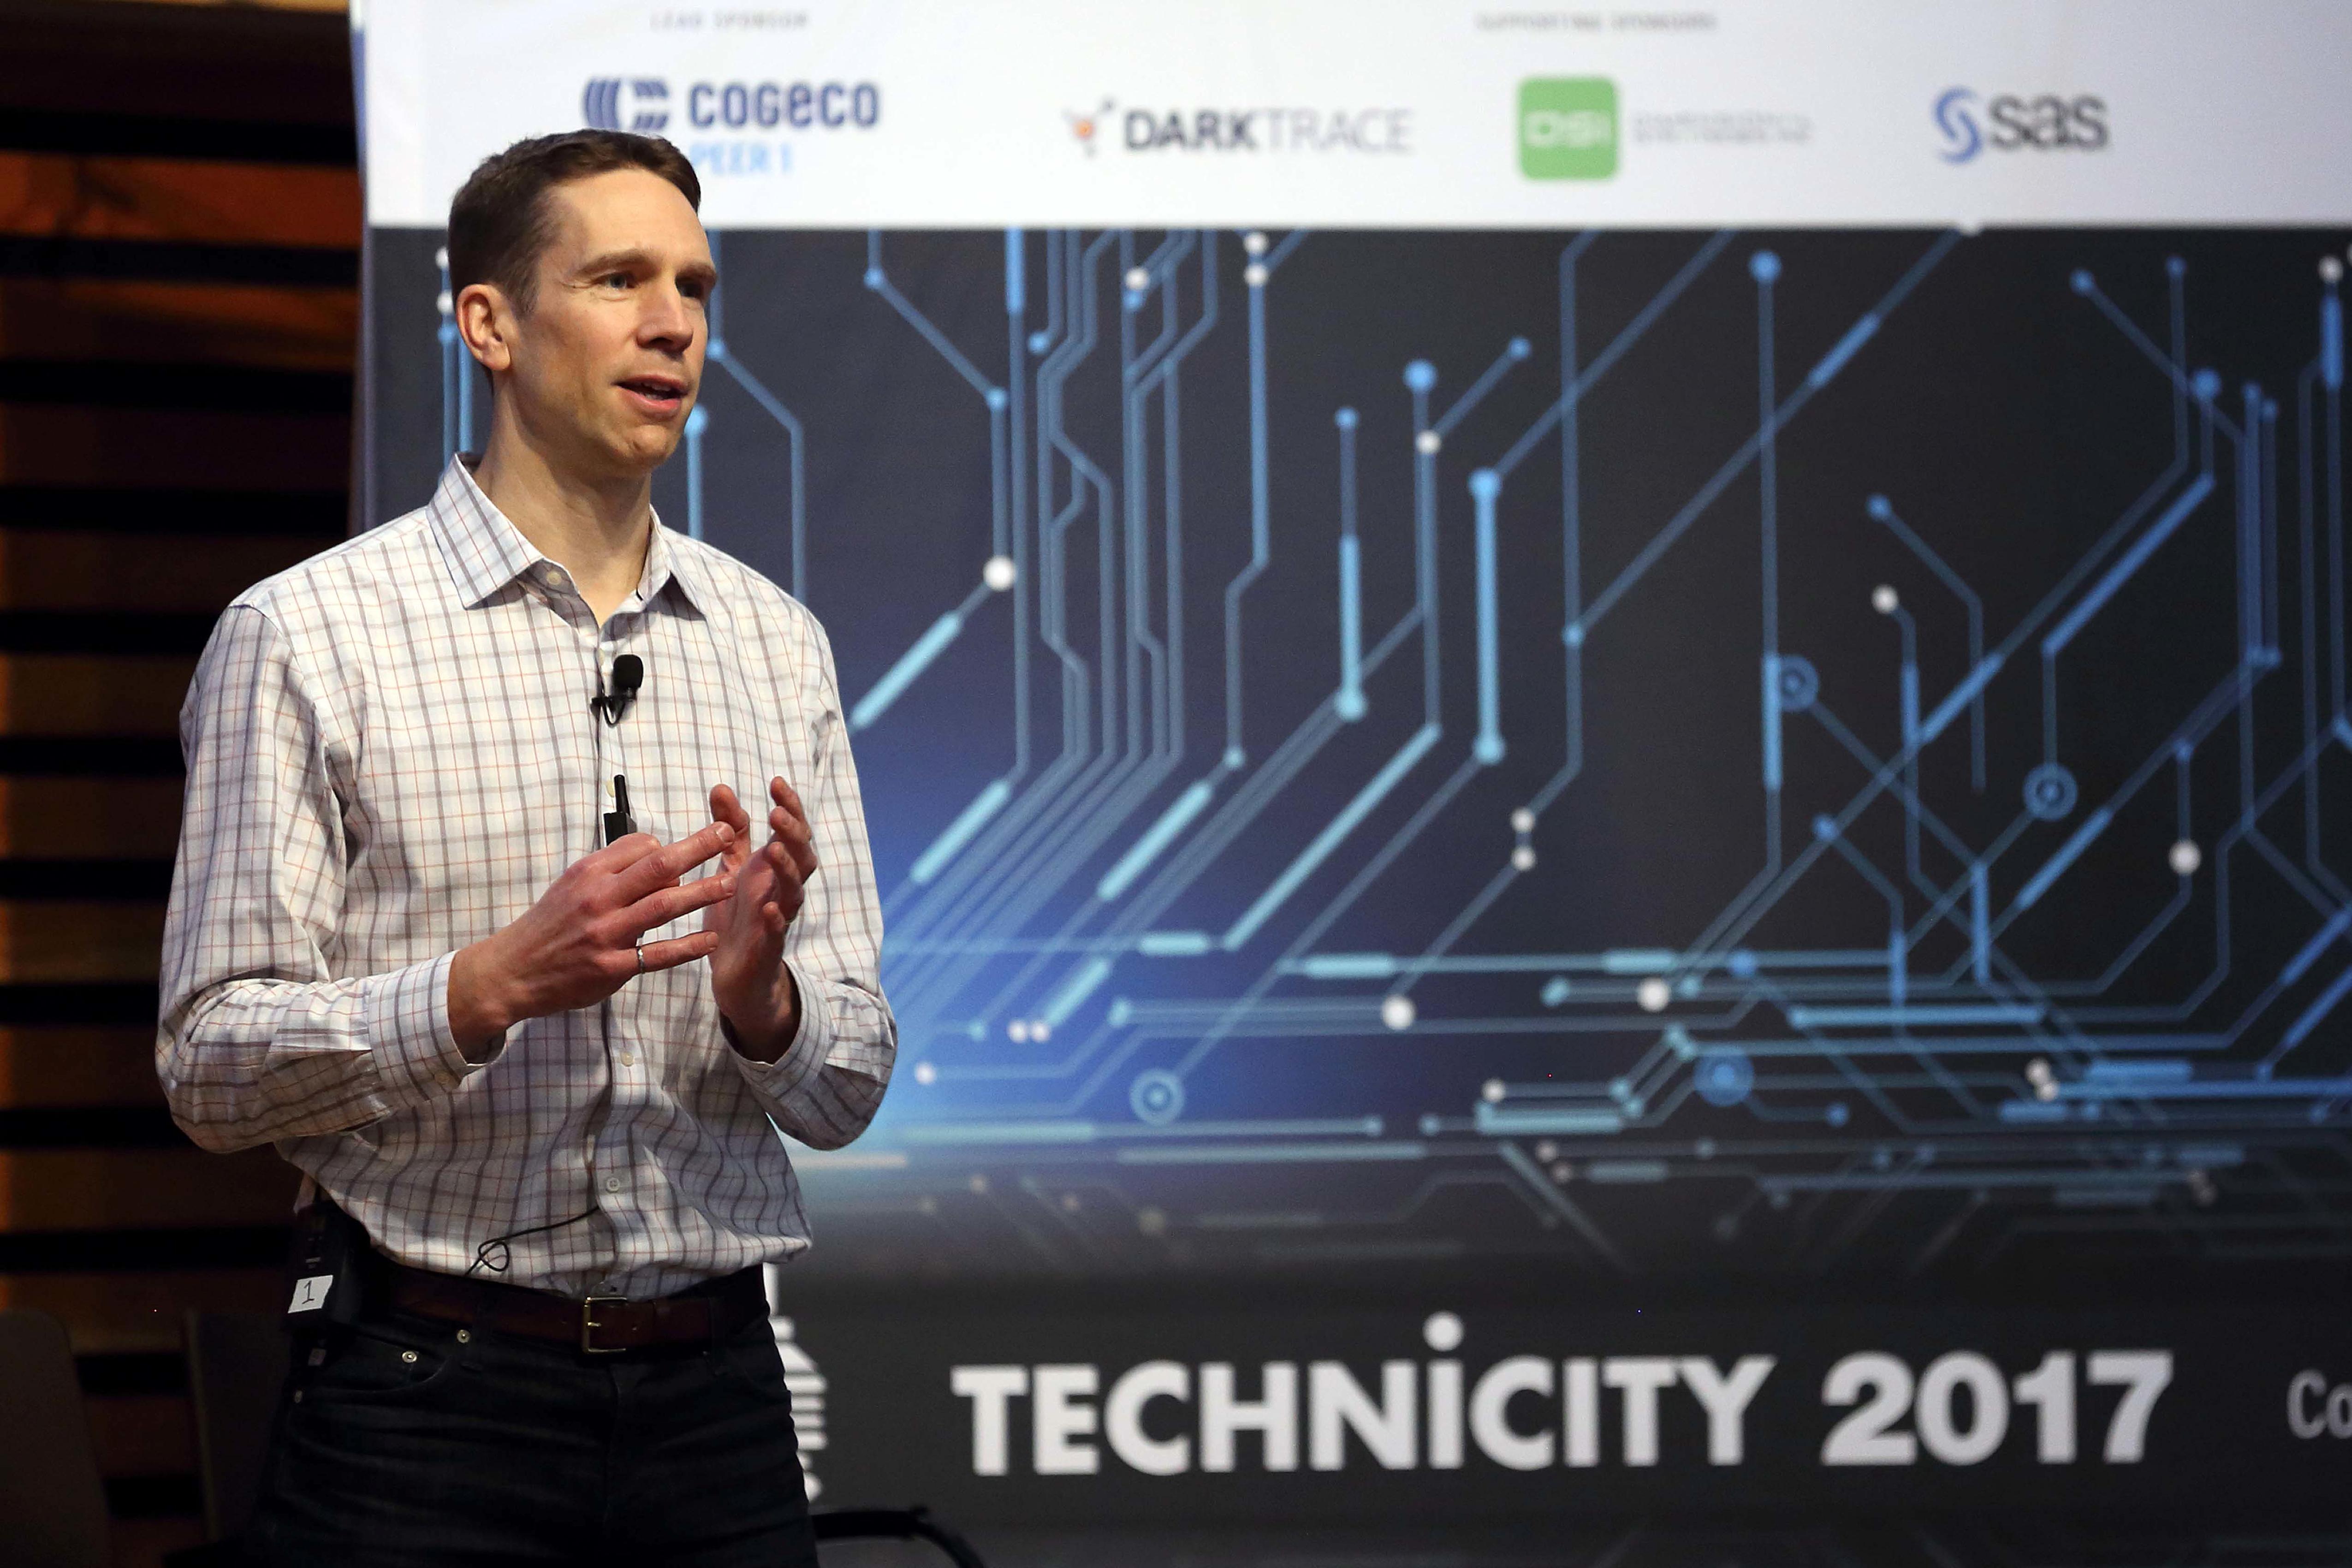 Technicity 2017 - Tomi Poutanen